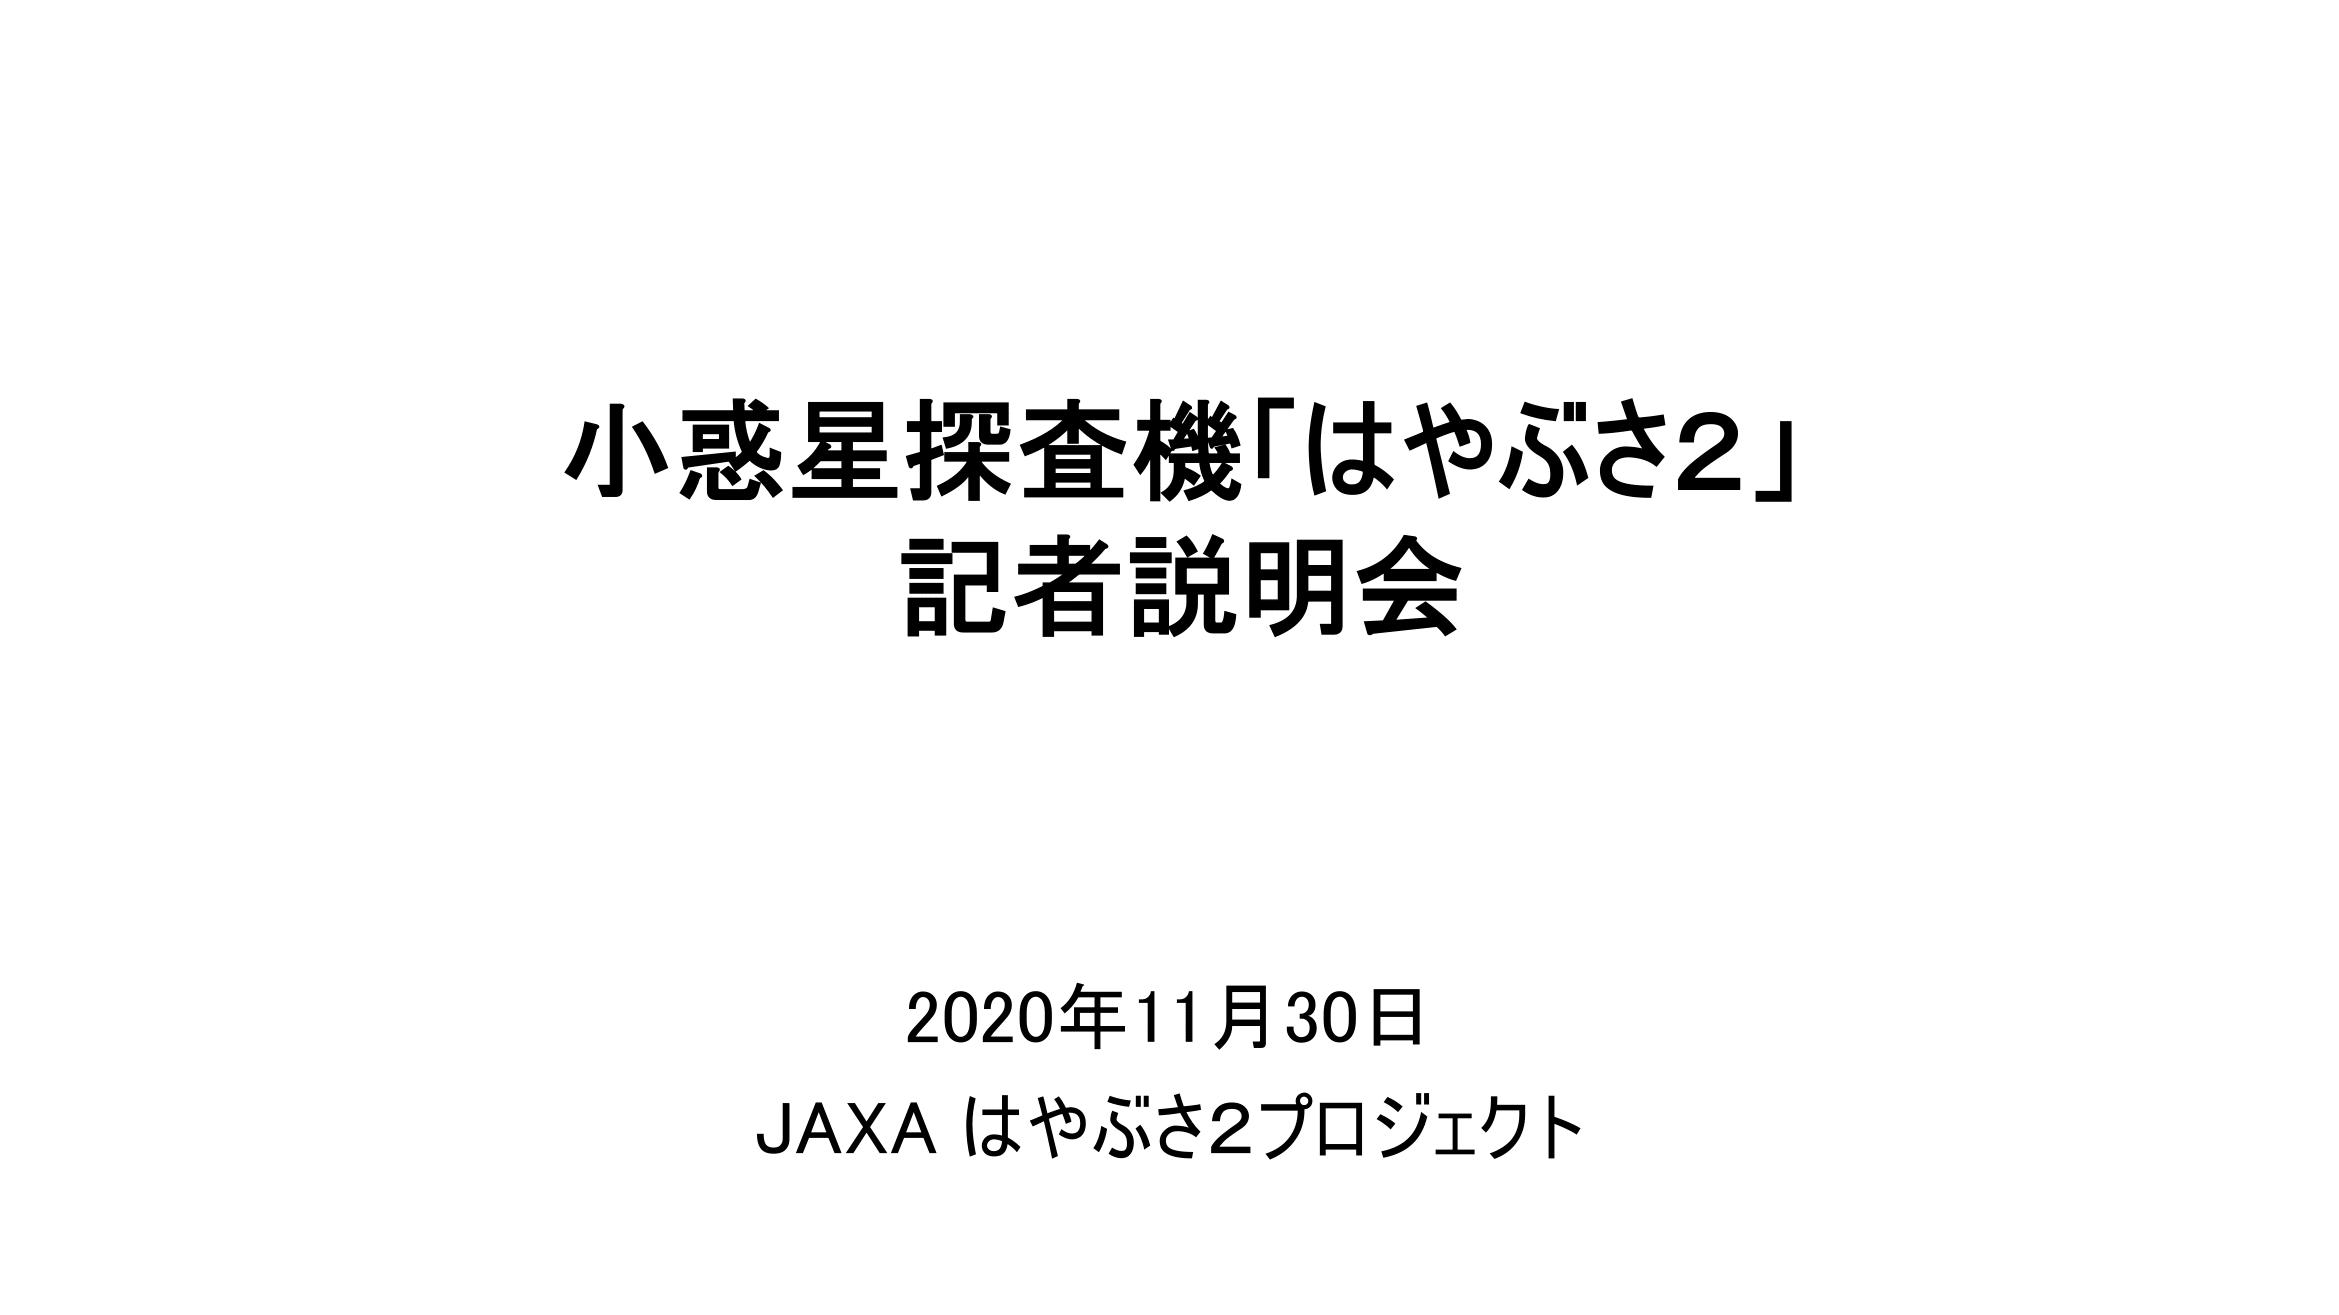 f:id:Imamura:20201130153915p:plain